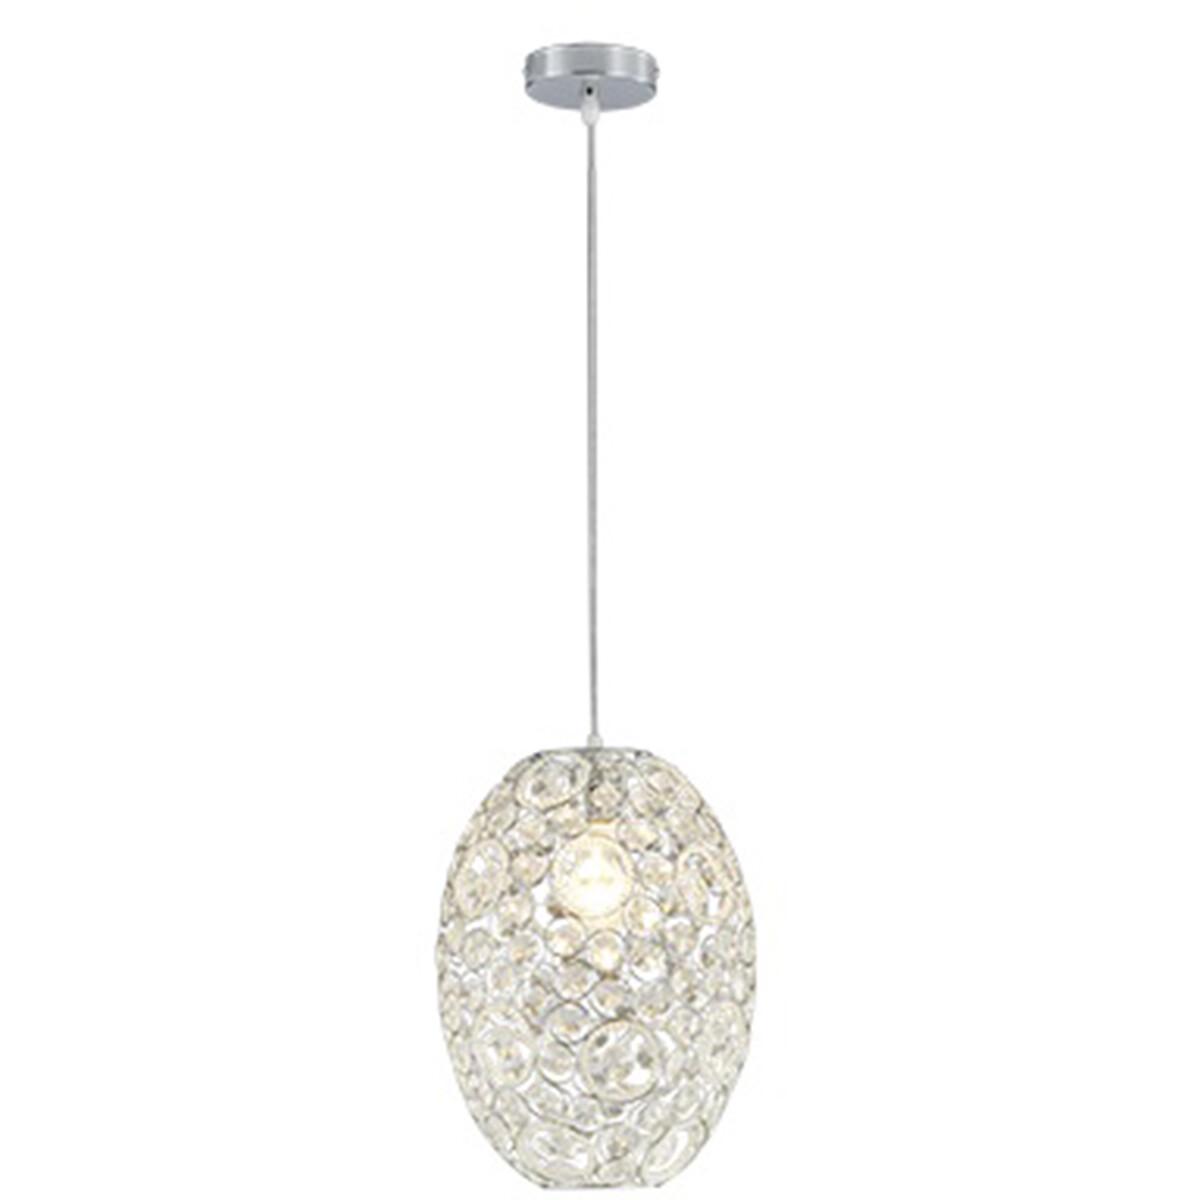 LED Hanglamp - Hangverlichting - Trion Ridan - E27 Fitting - Rond - Mat Chroom - Aluminium